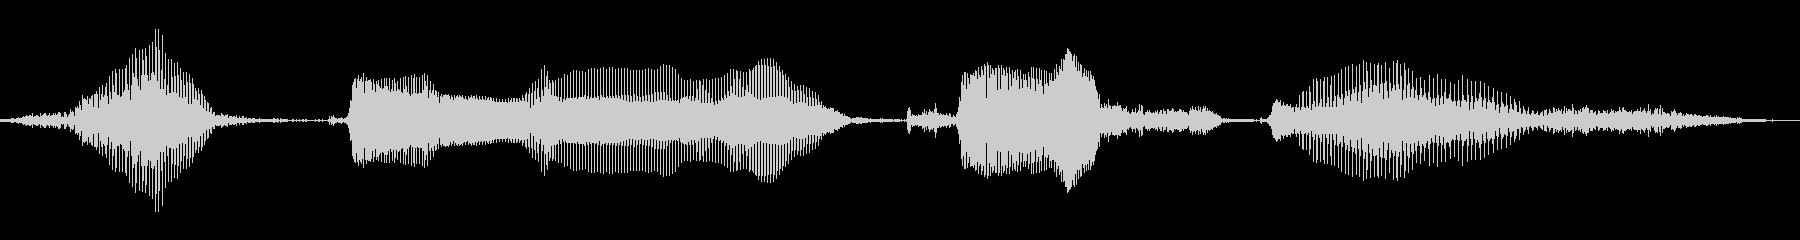 Happy Merry Christmas!'s unreproduced waveform